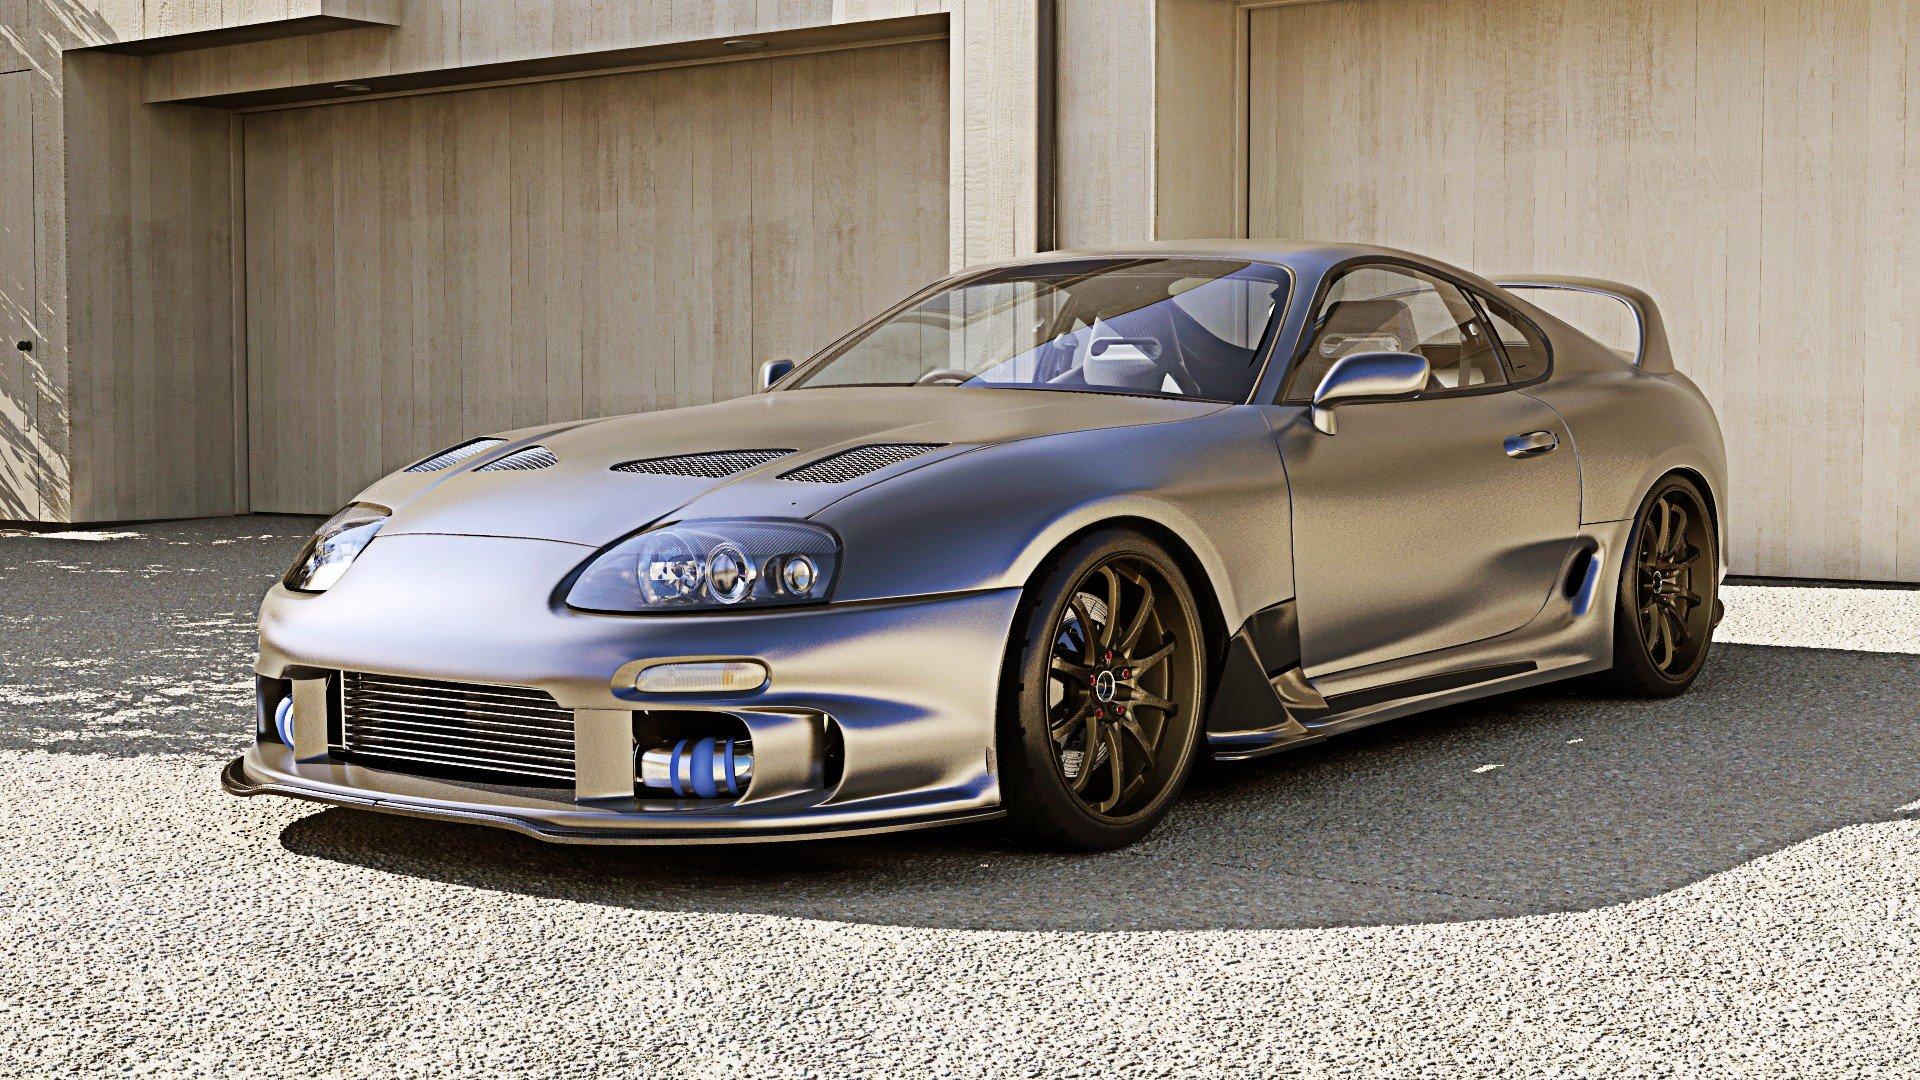 Toyota supra tuning cars coupe japan turbo wallpaper 1920x1080 1920x1080